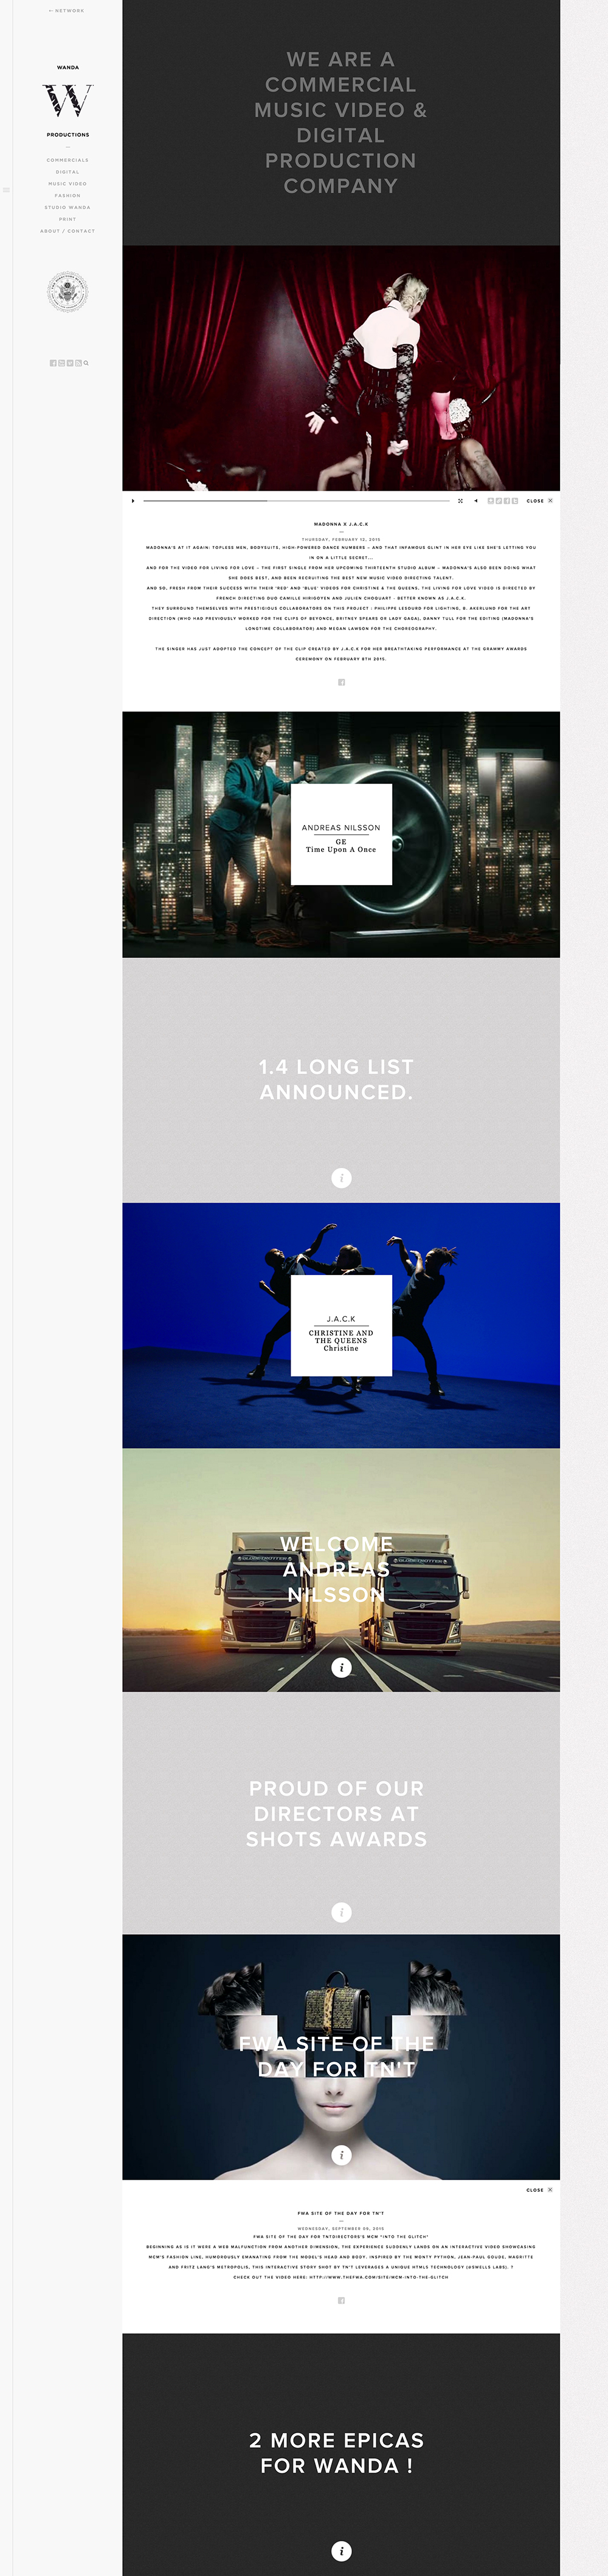 1_WANDA_Homepage-Teddy-Delcroix.jpg